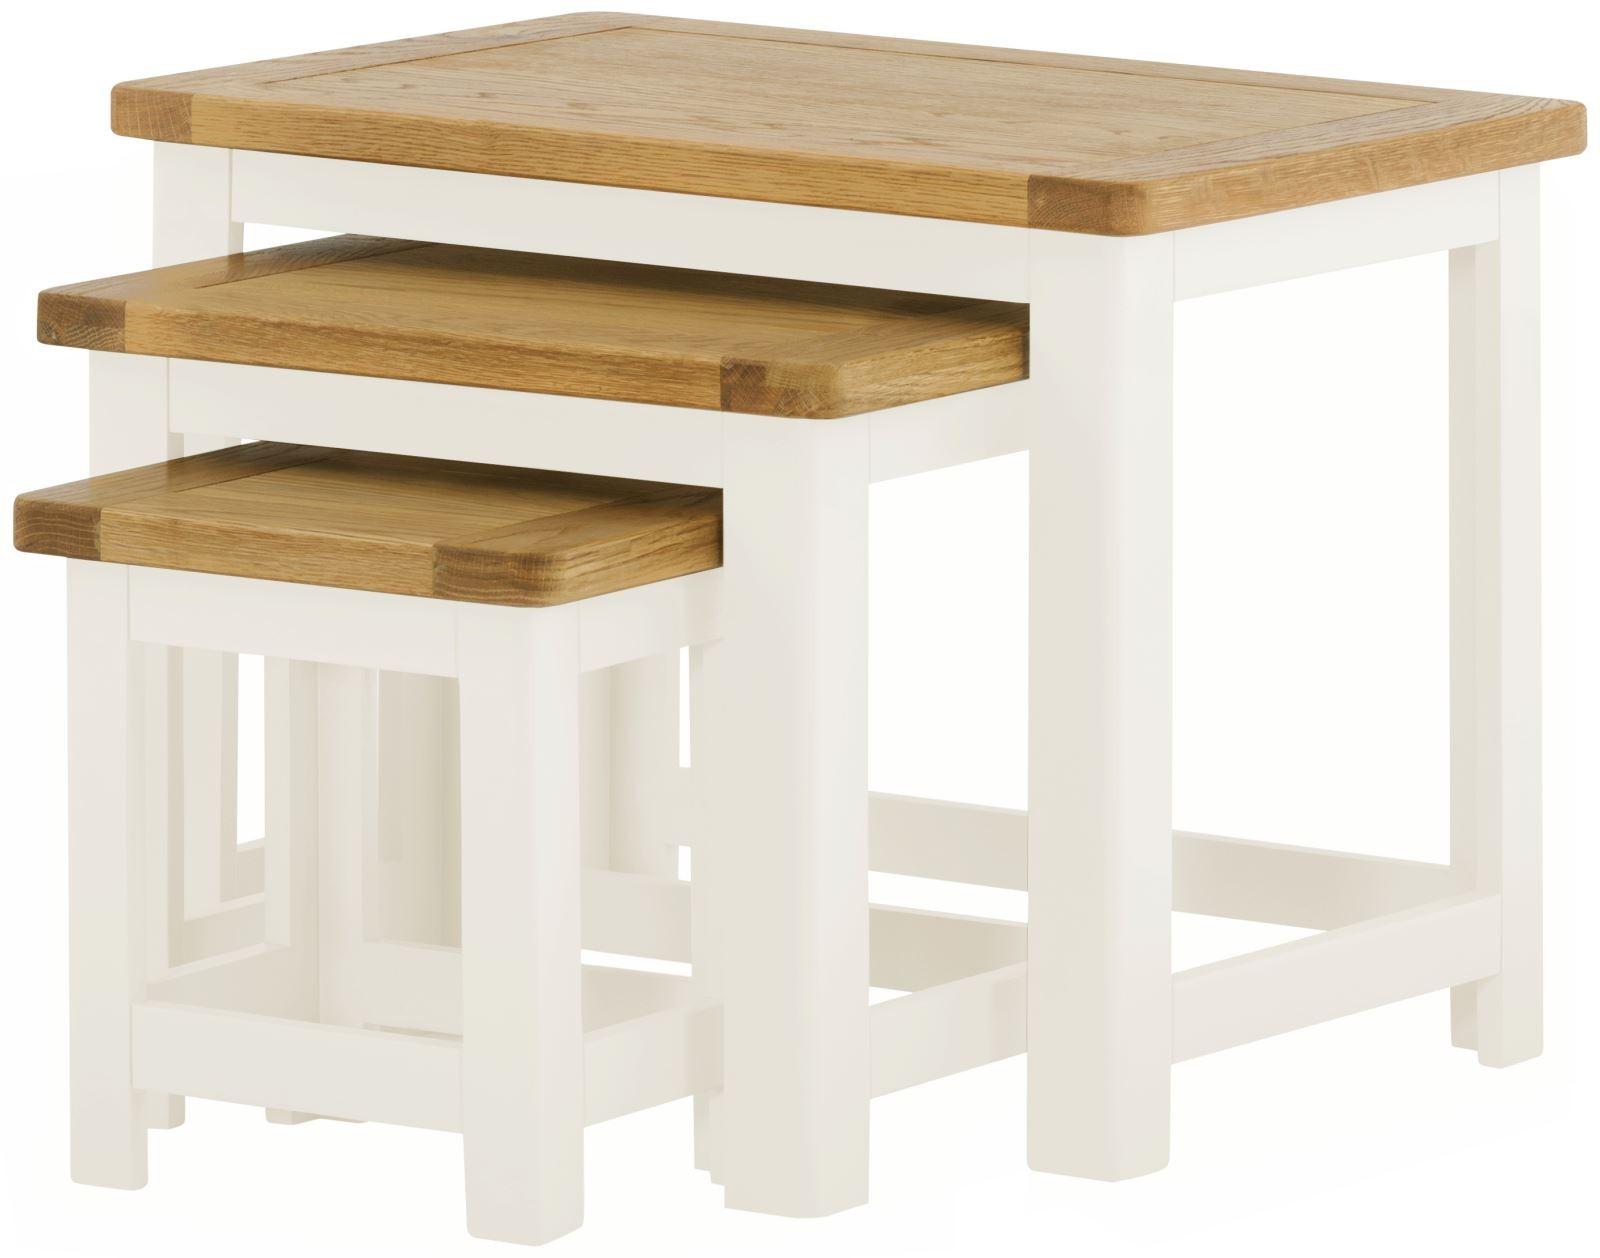 PRESTON Nest of Tables